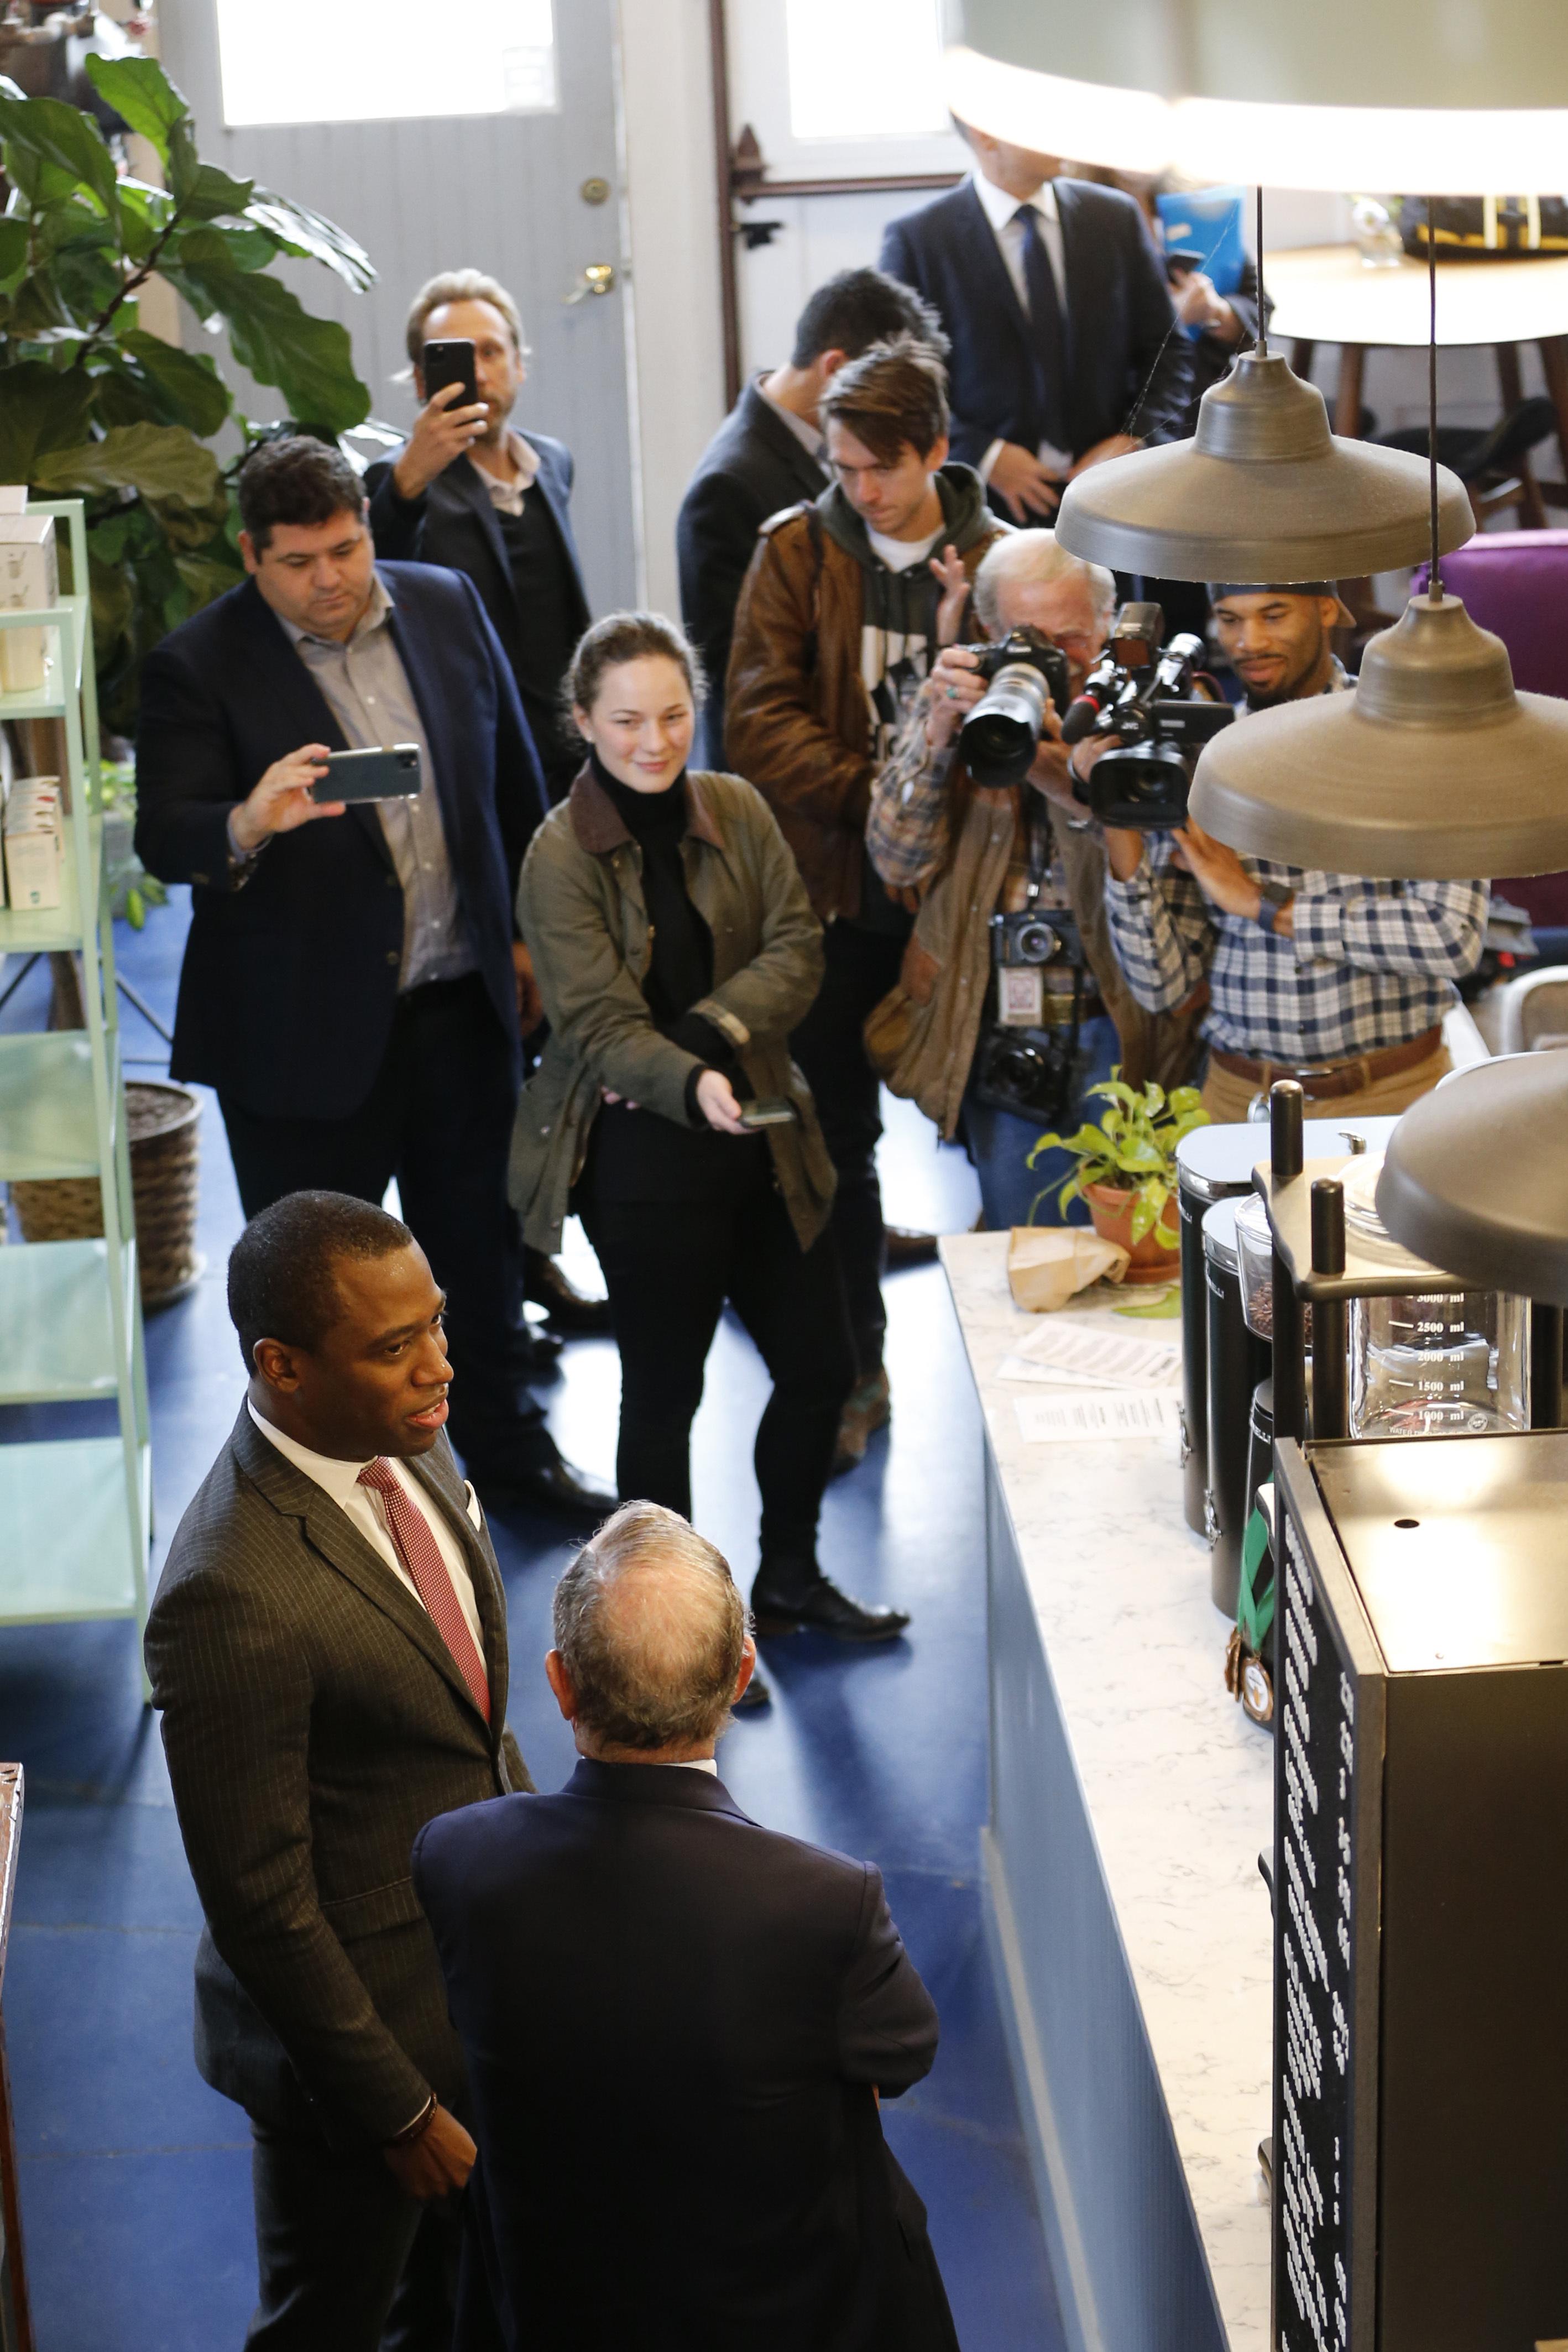 Bloomberg, Northam push back on gun law misinformation